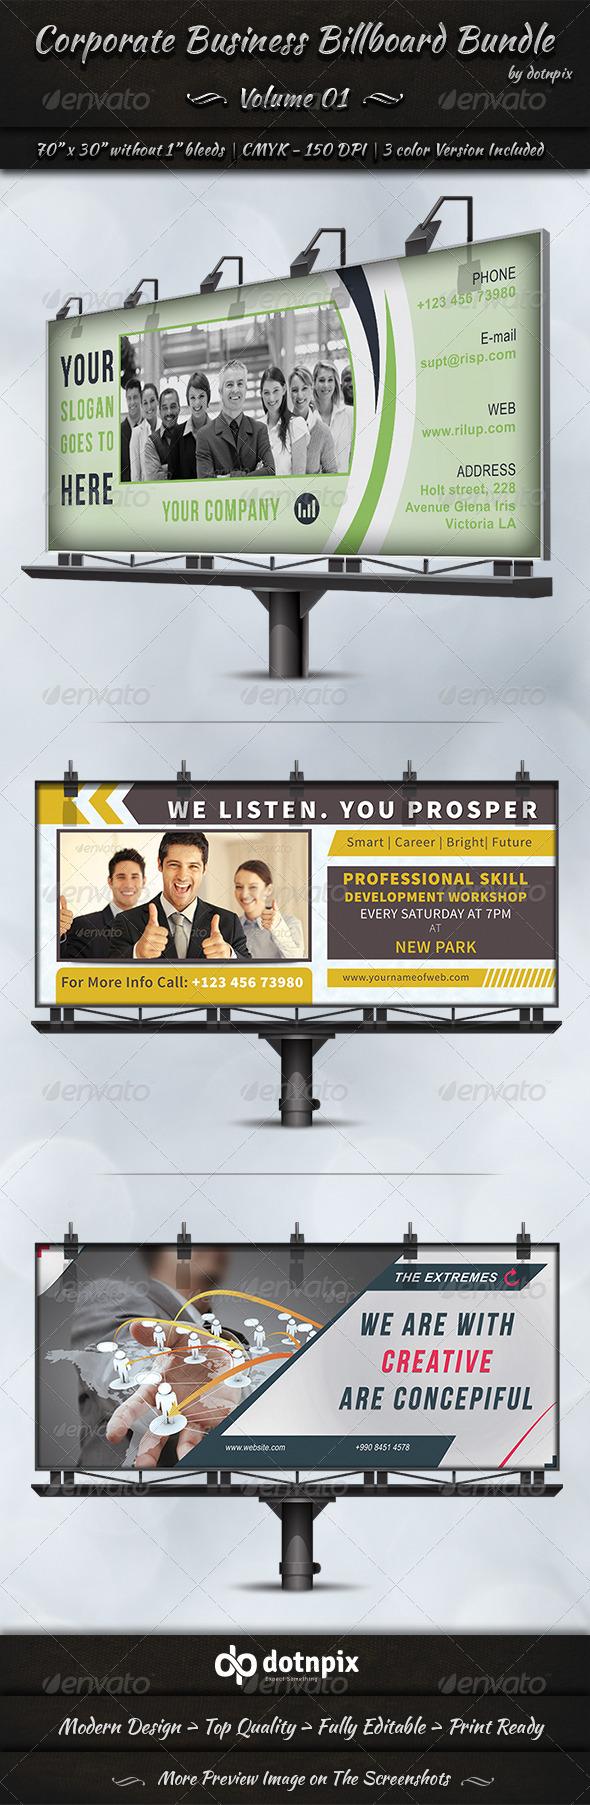 GraphicRiver Corporate Business Billboard Bundle Volume 1 6933464